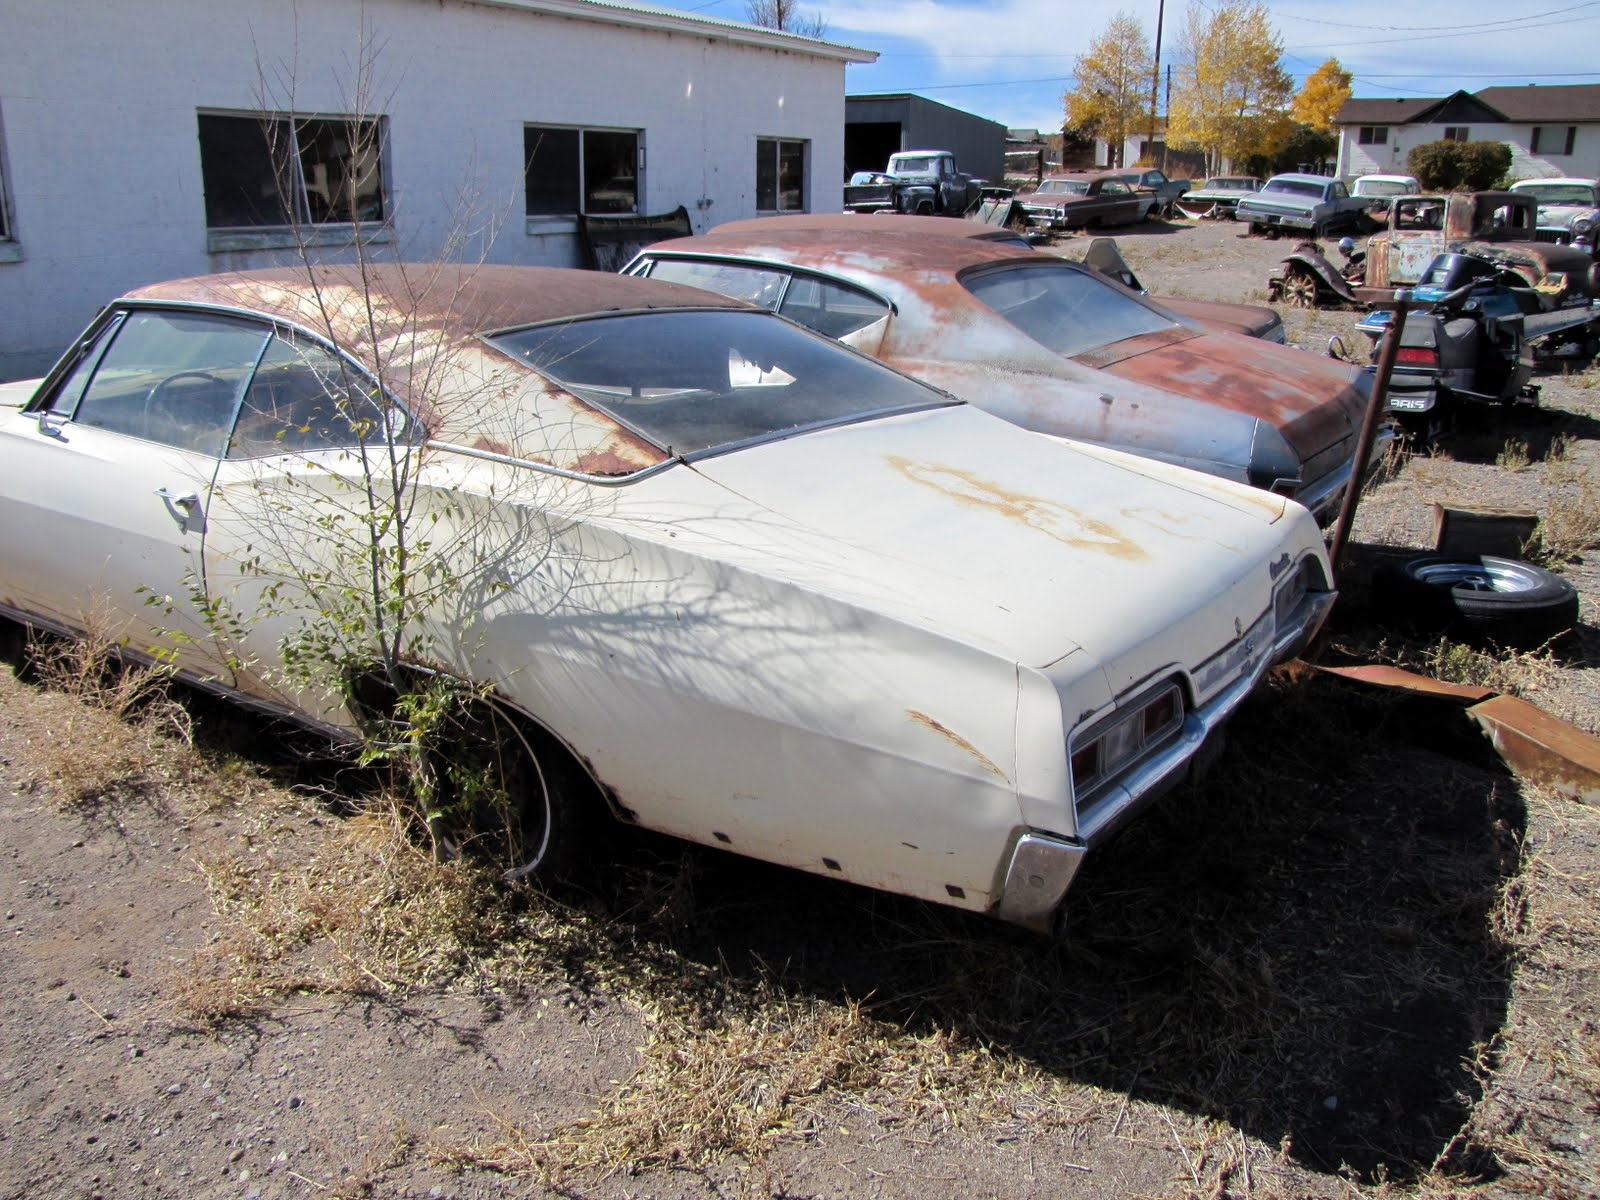 1968 Chevrolet Impala Sports Coupe, 1969 Chevrolet Chevelle